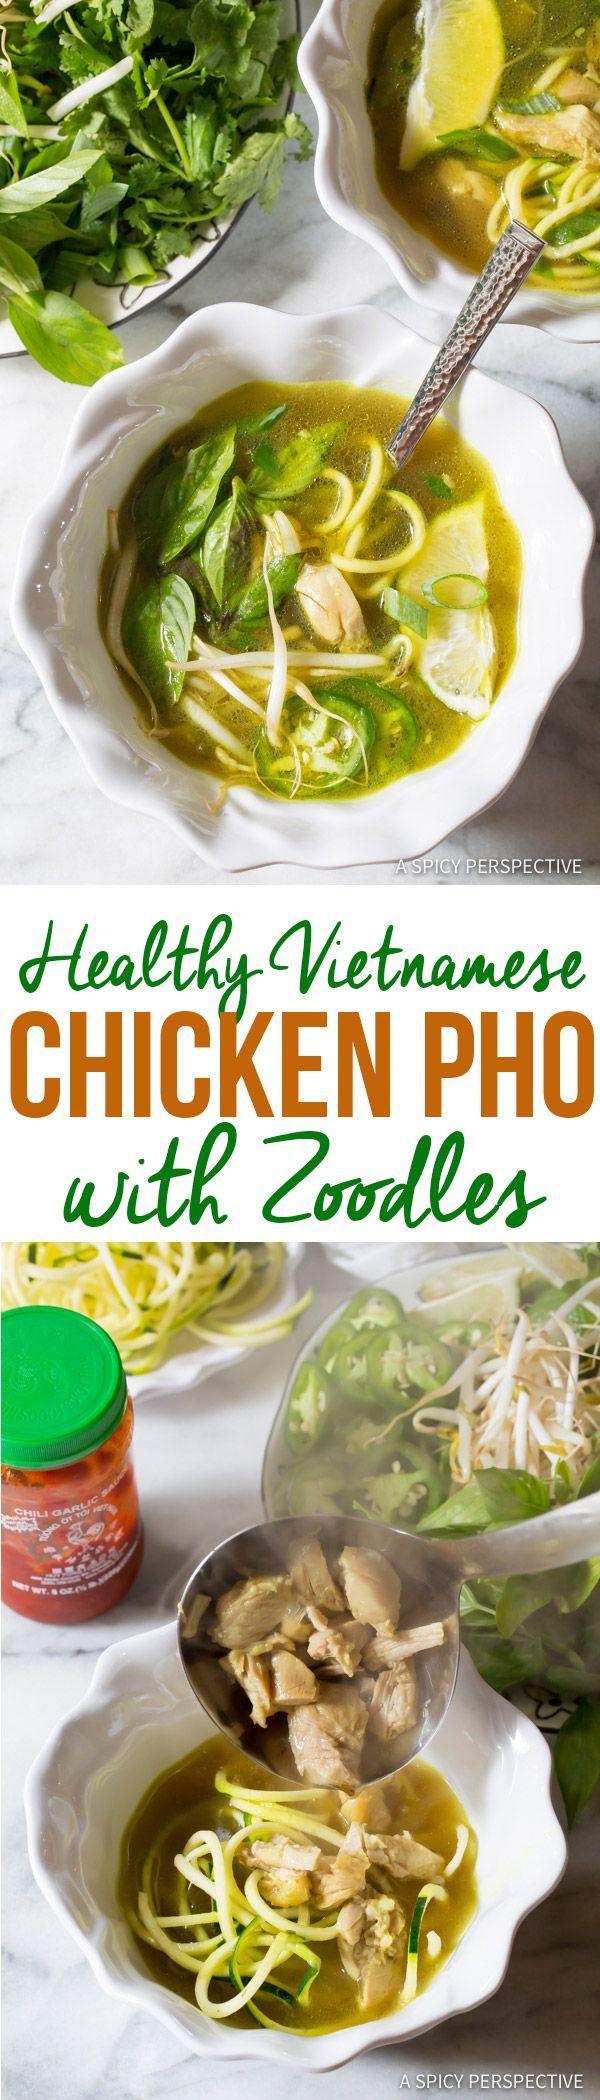 Healthy Vietnamese Chicken Pho with Zoodles (Gluten Free & Paleo!) | ASpicyPerspective.com via @spicyperspectiv